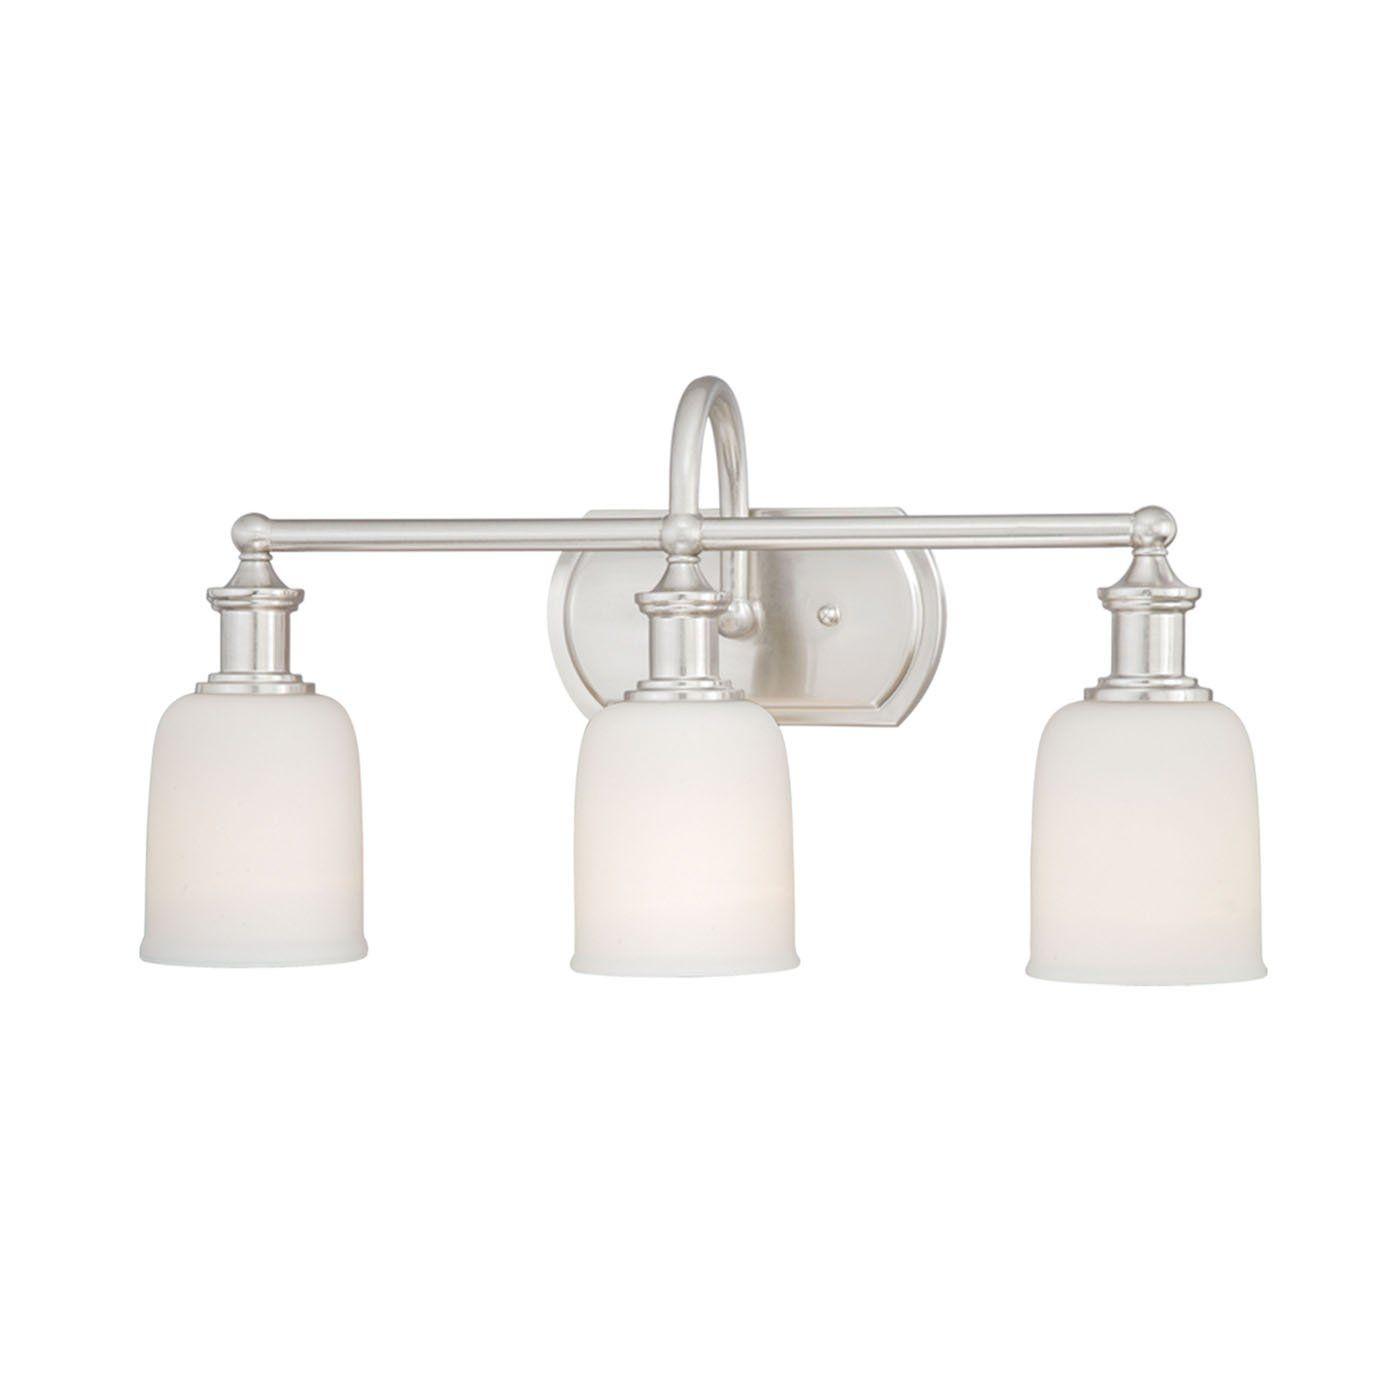 Vaxcel W0013 Elliot 3 Light Vanity Fixture | Bathroom | Pinterest ...